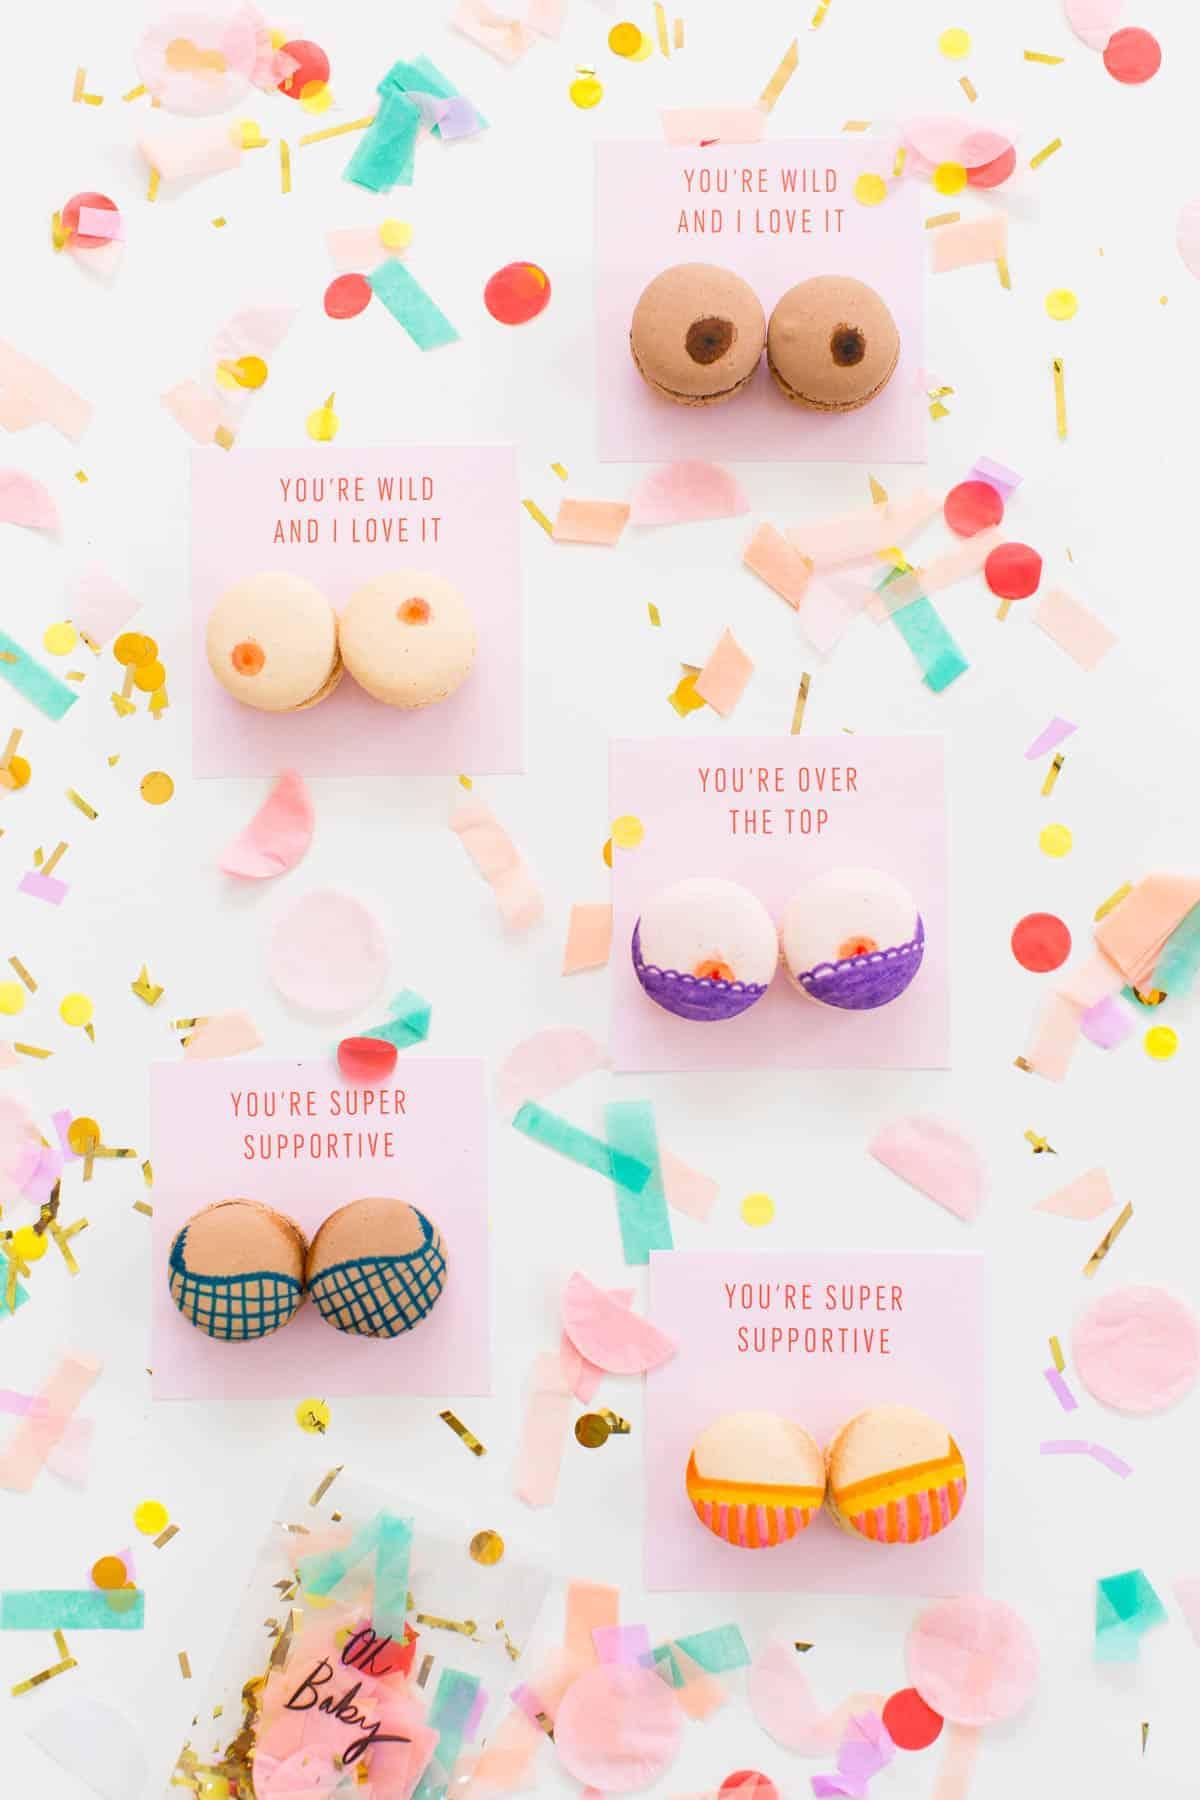 Boob Macarons & Printable Valentines